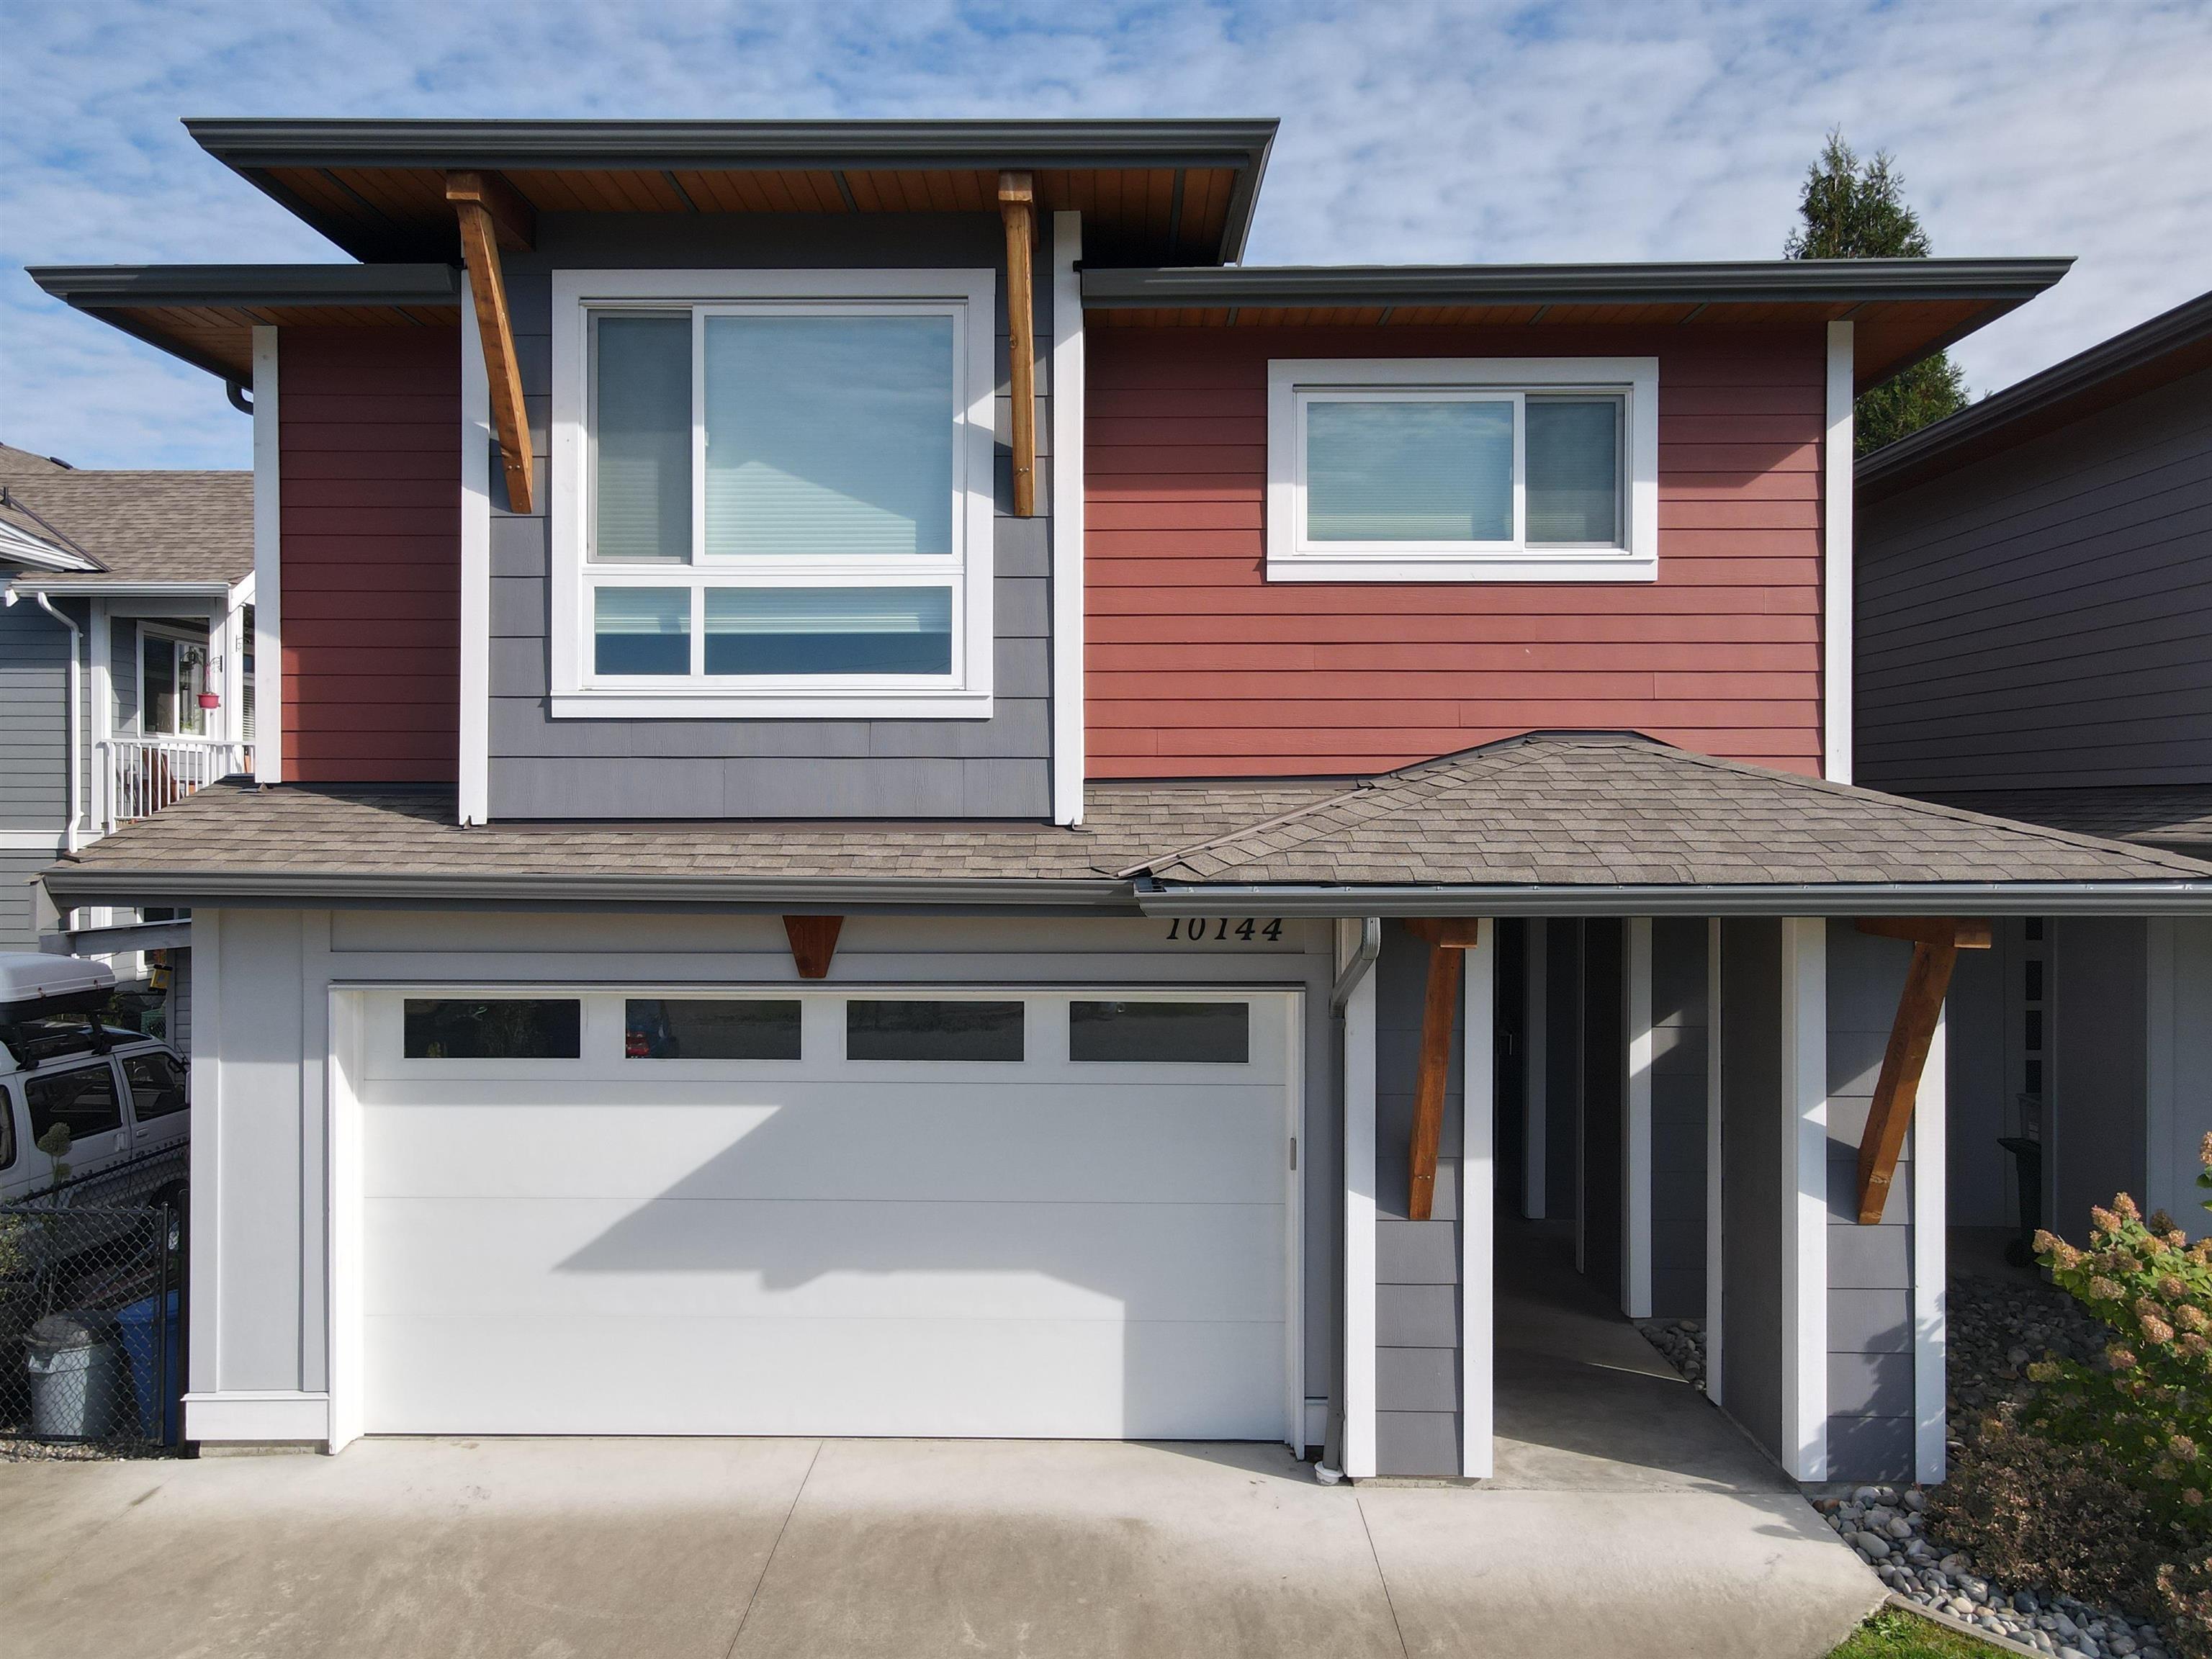 10144 KILLARNEY DRIVE - Fairfield Island House/Single Family for sale, 5 Bedrooms (R2625716) - #1